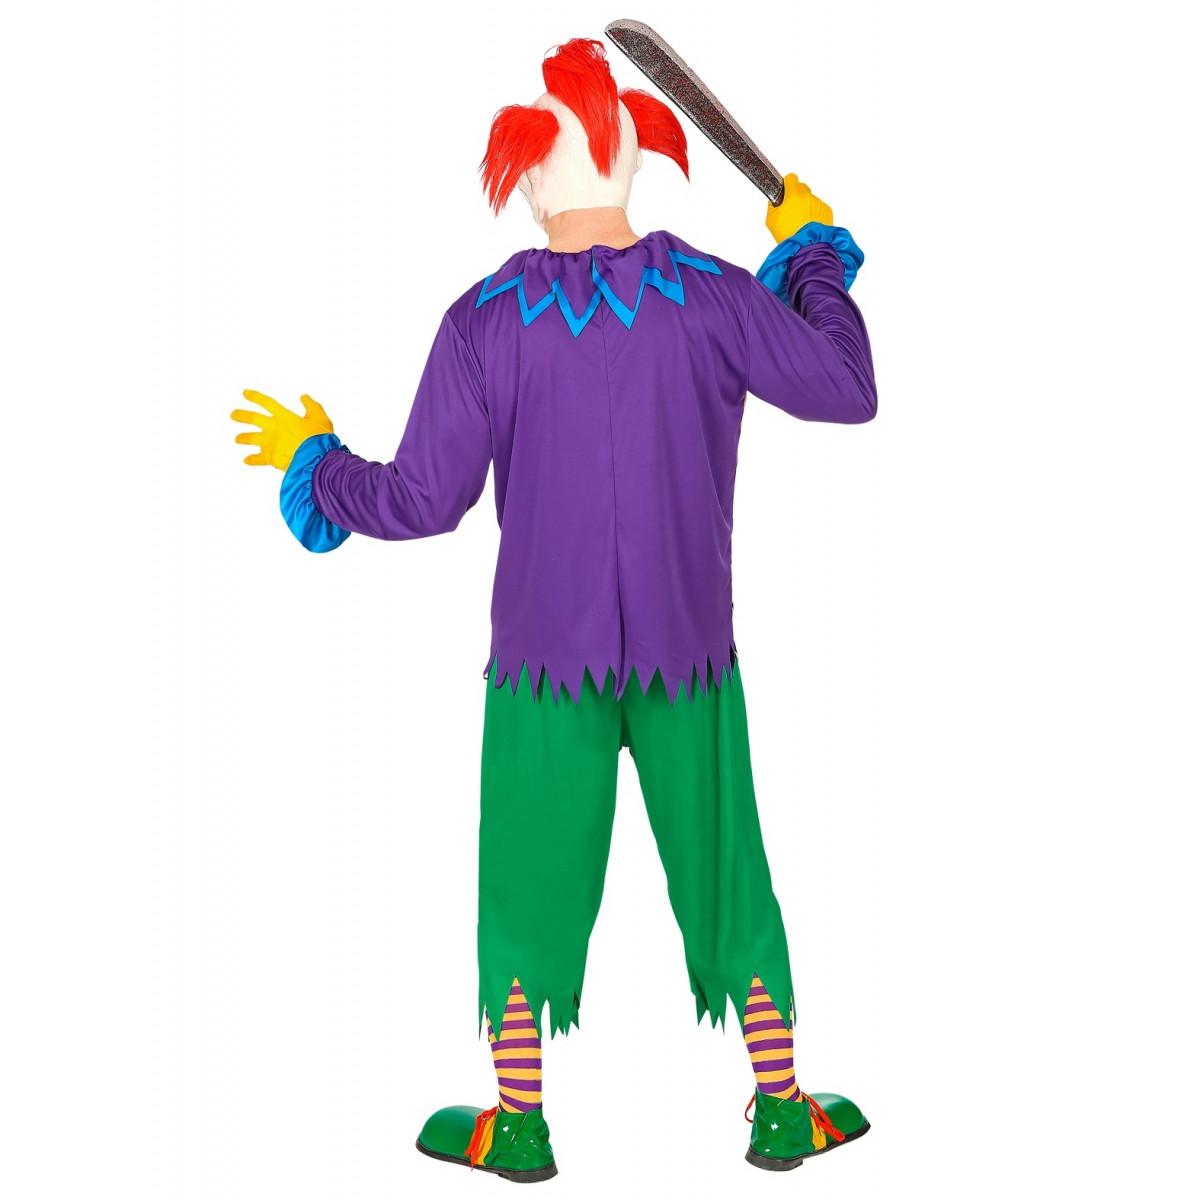 Kostum za maškare Joker 0196